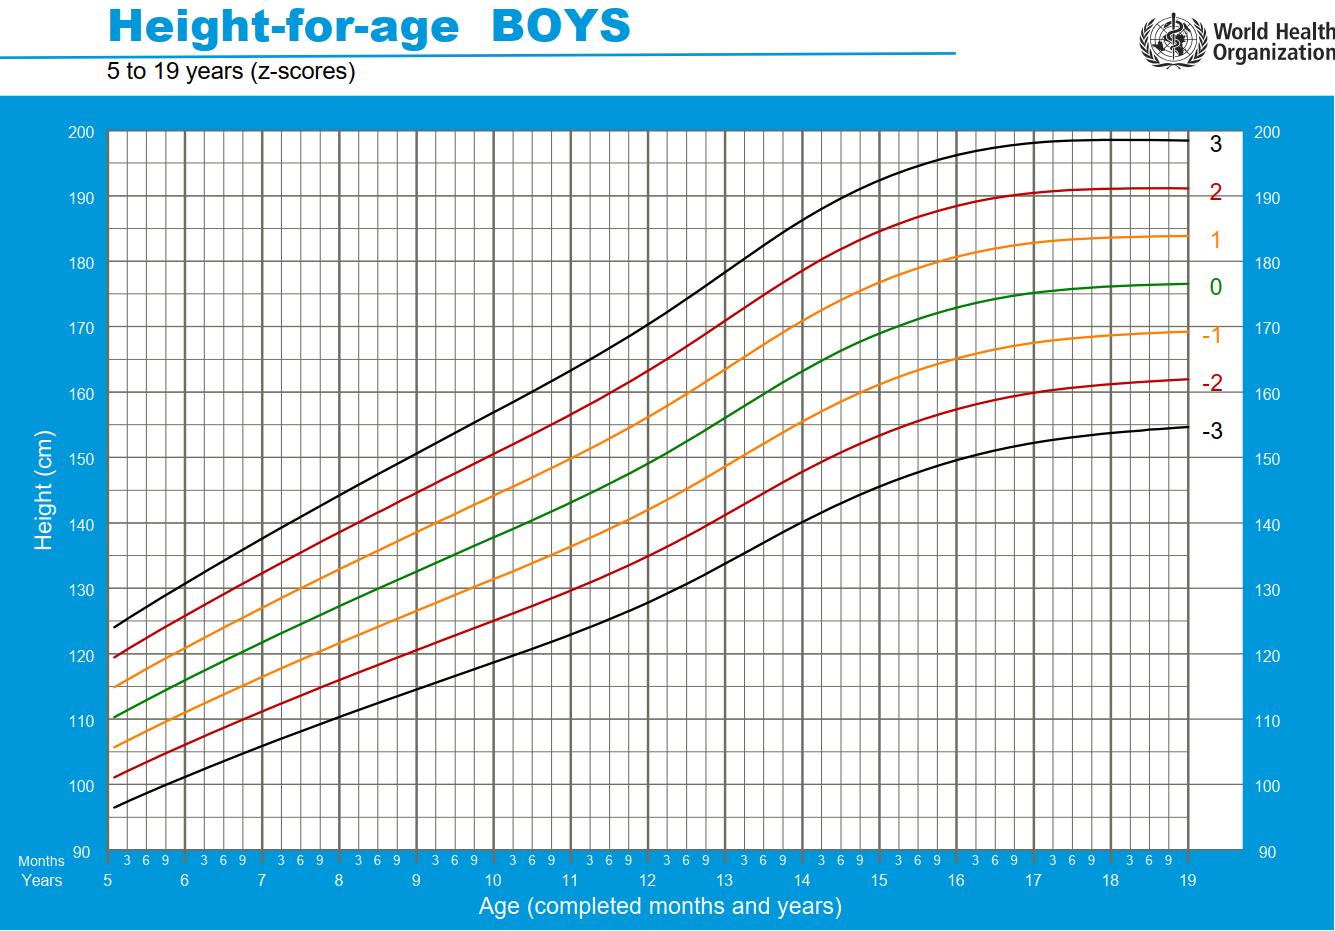 biểu đồ chiều cao chuẩn ở tuổi 14 theo WHO